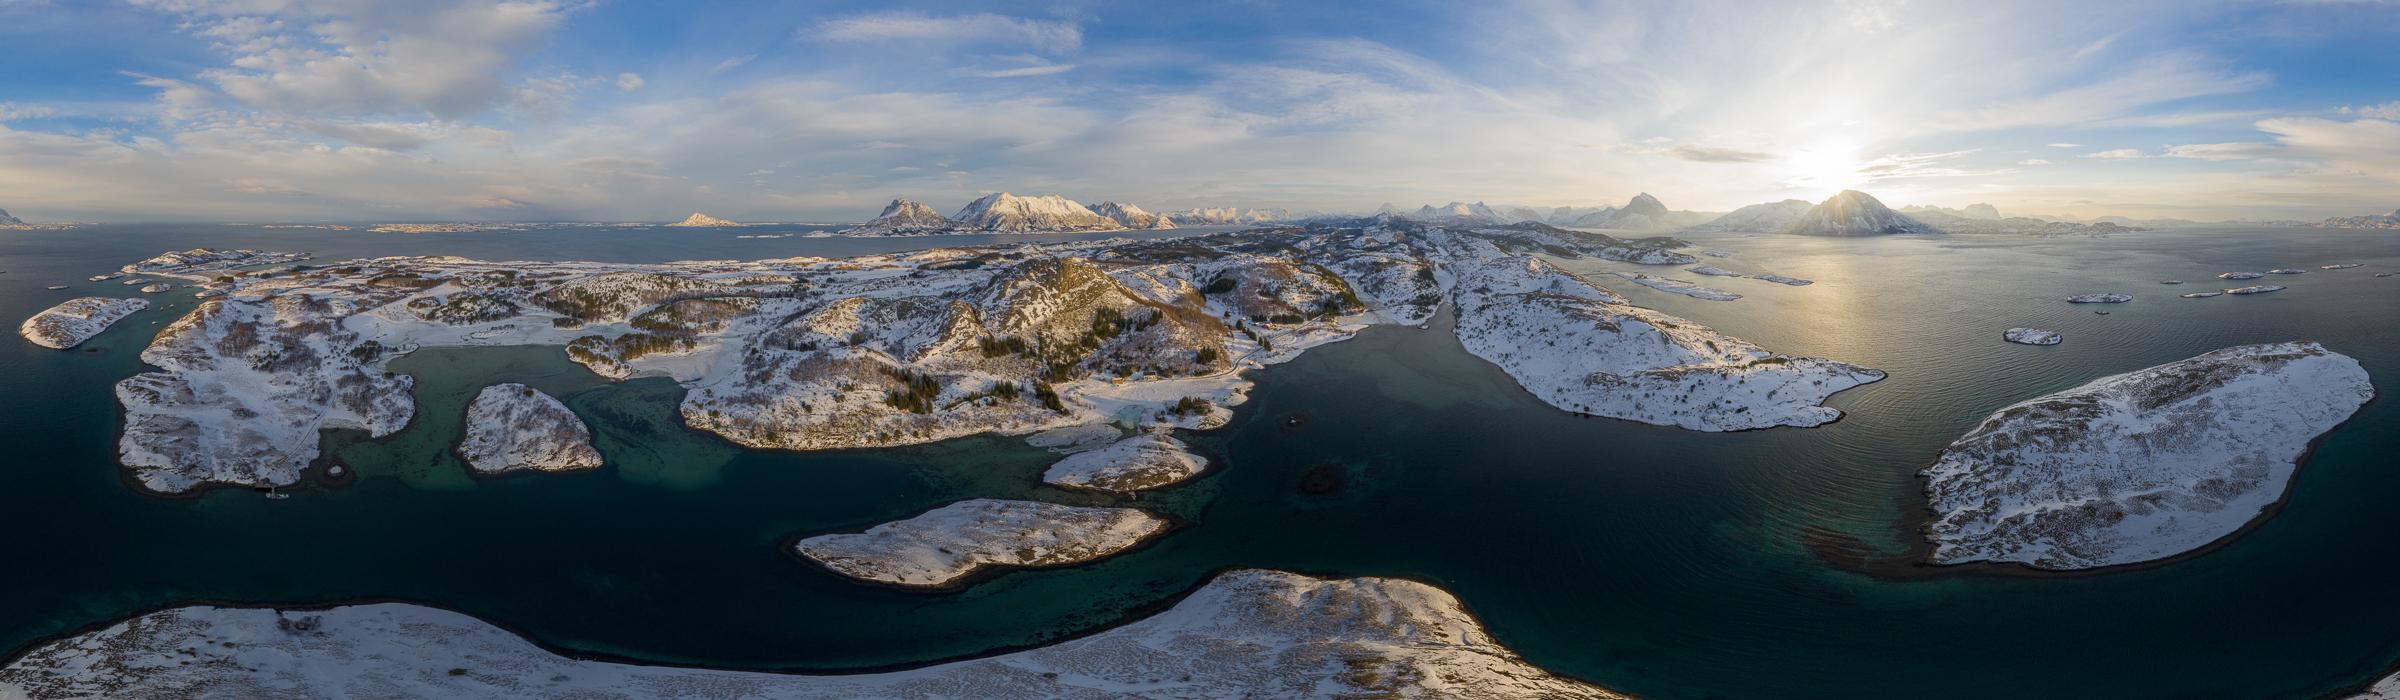 Drohnenaufnahme über dem Tjongsfjord